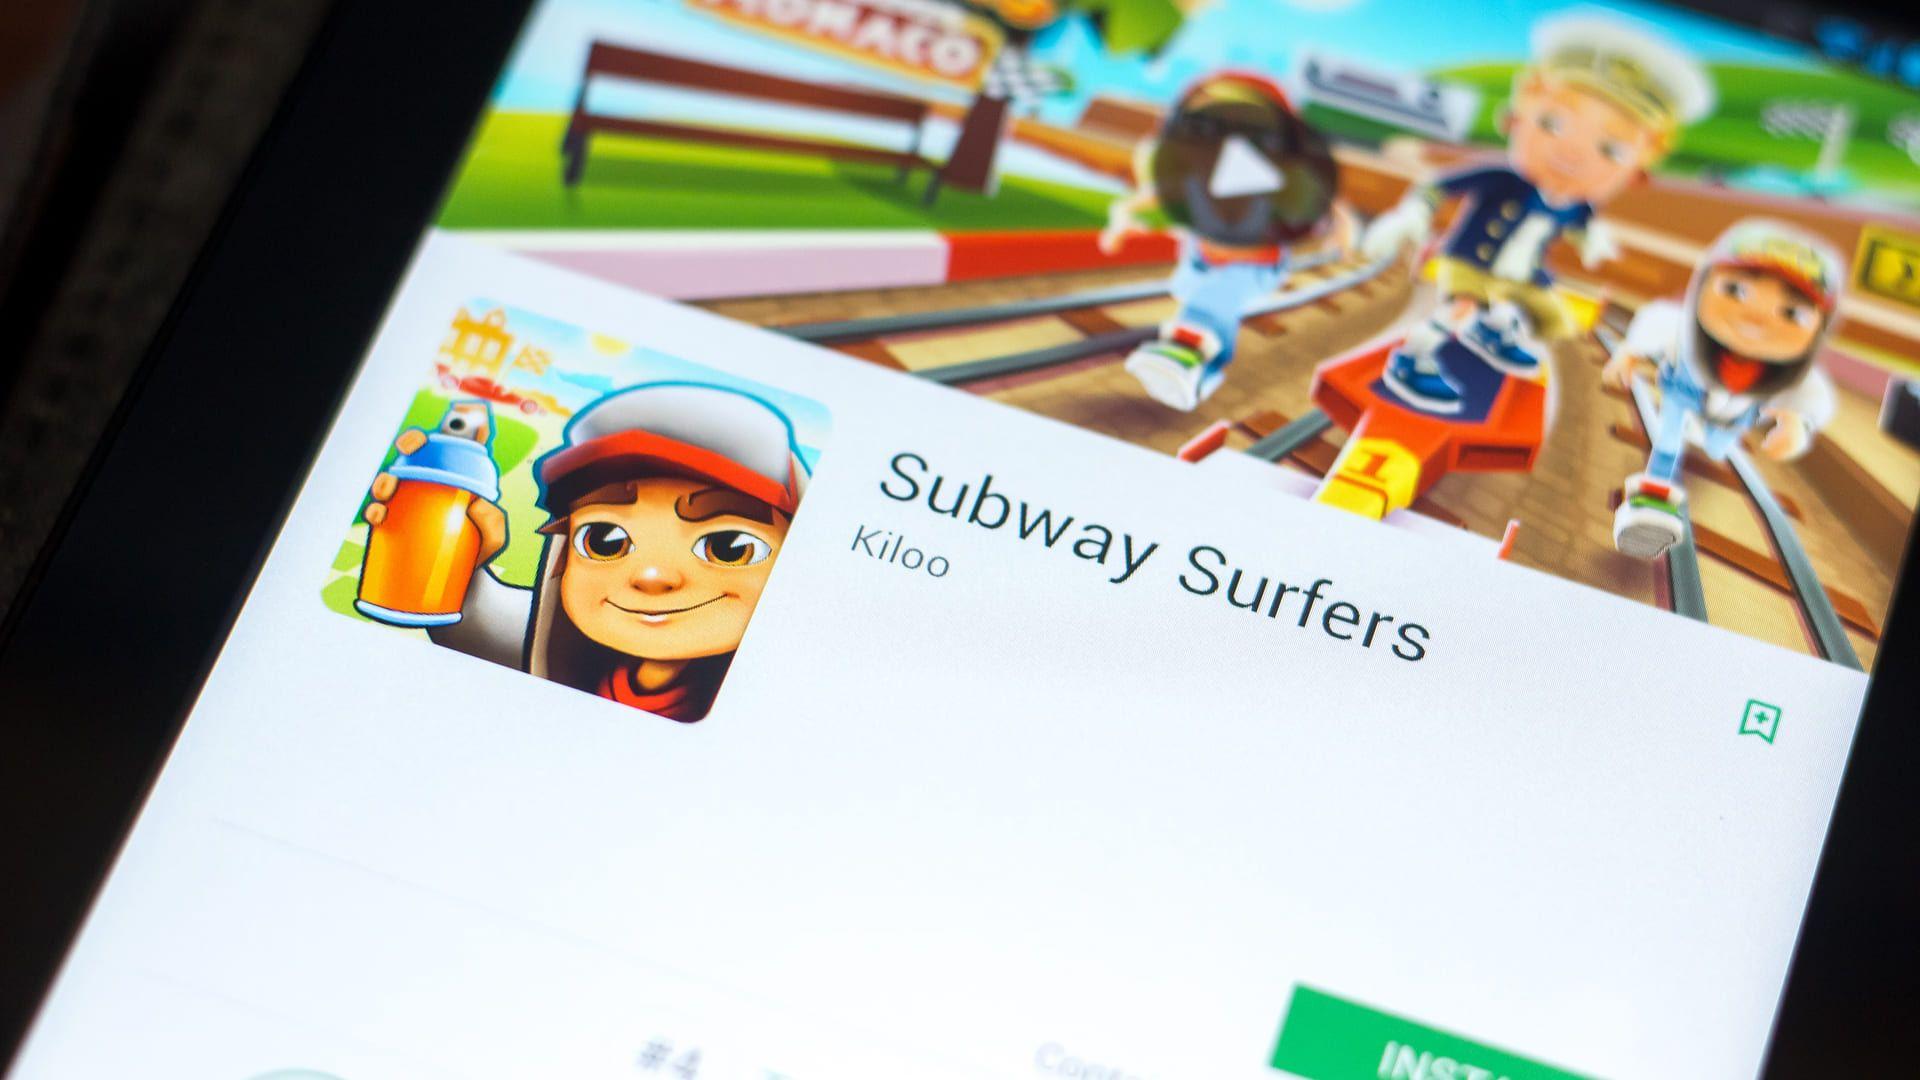 Subway Surfers está disponível para iOS e Android (Foto: Sharaf Maksumov/Shutterstock)